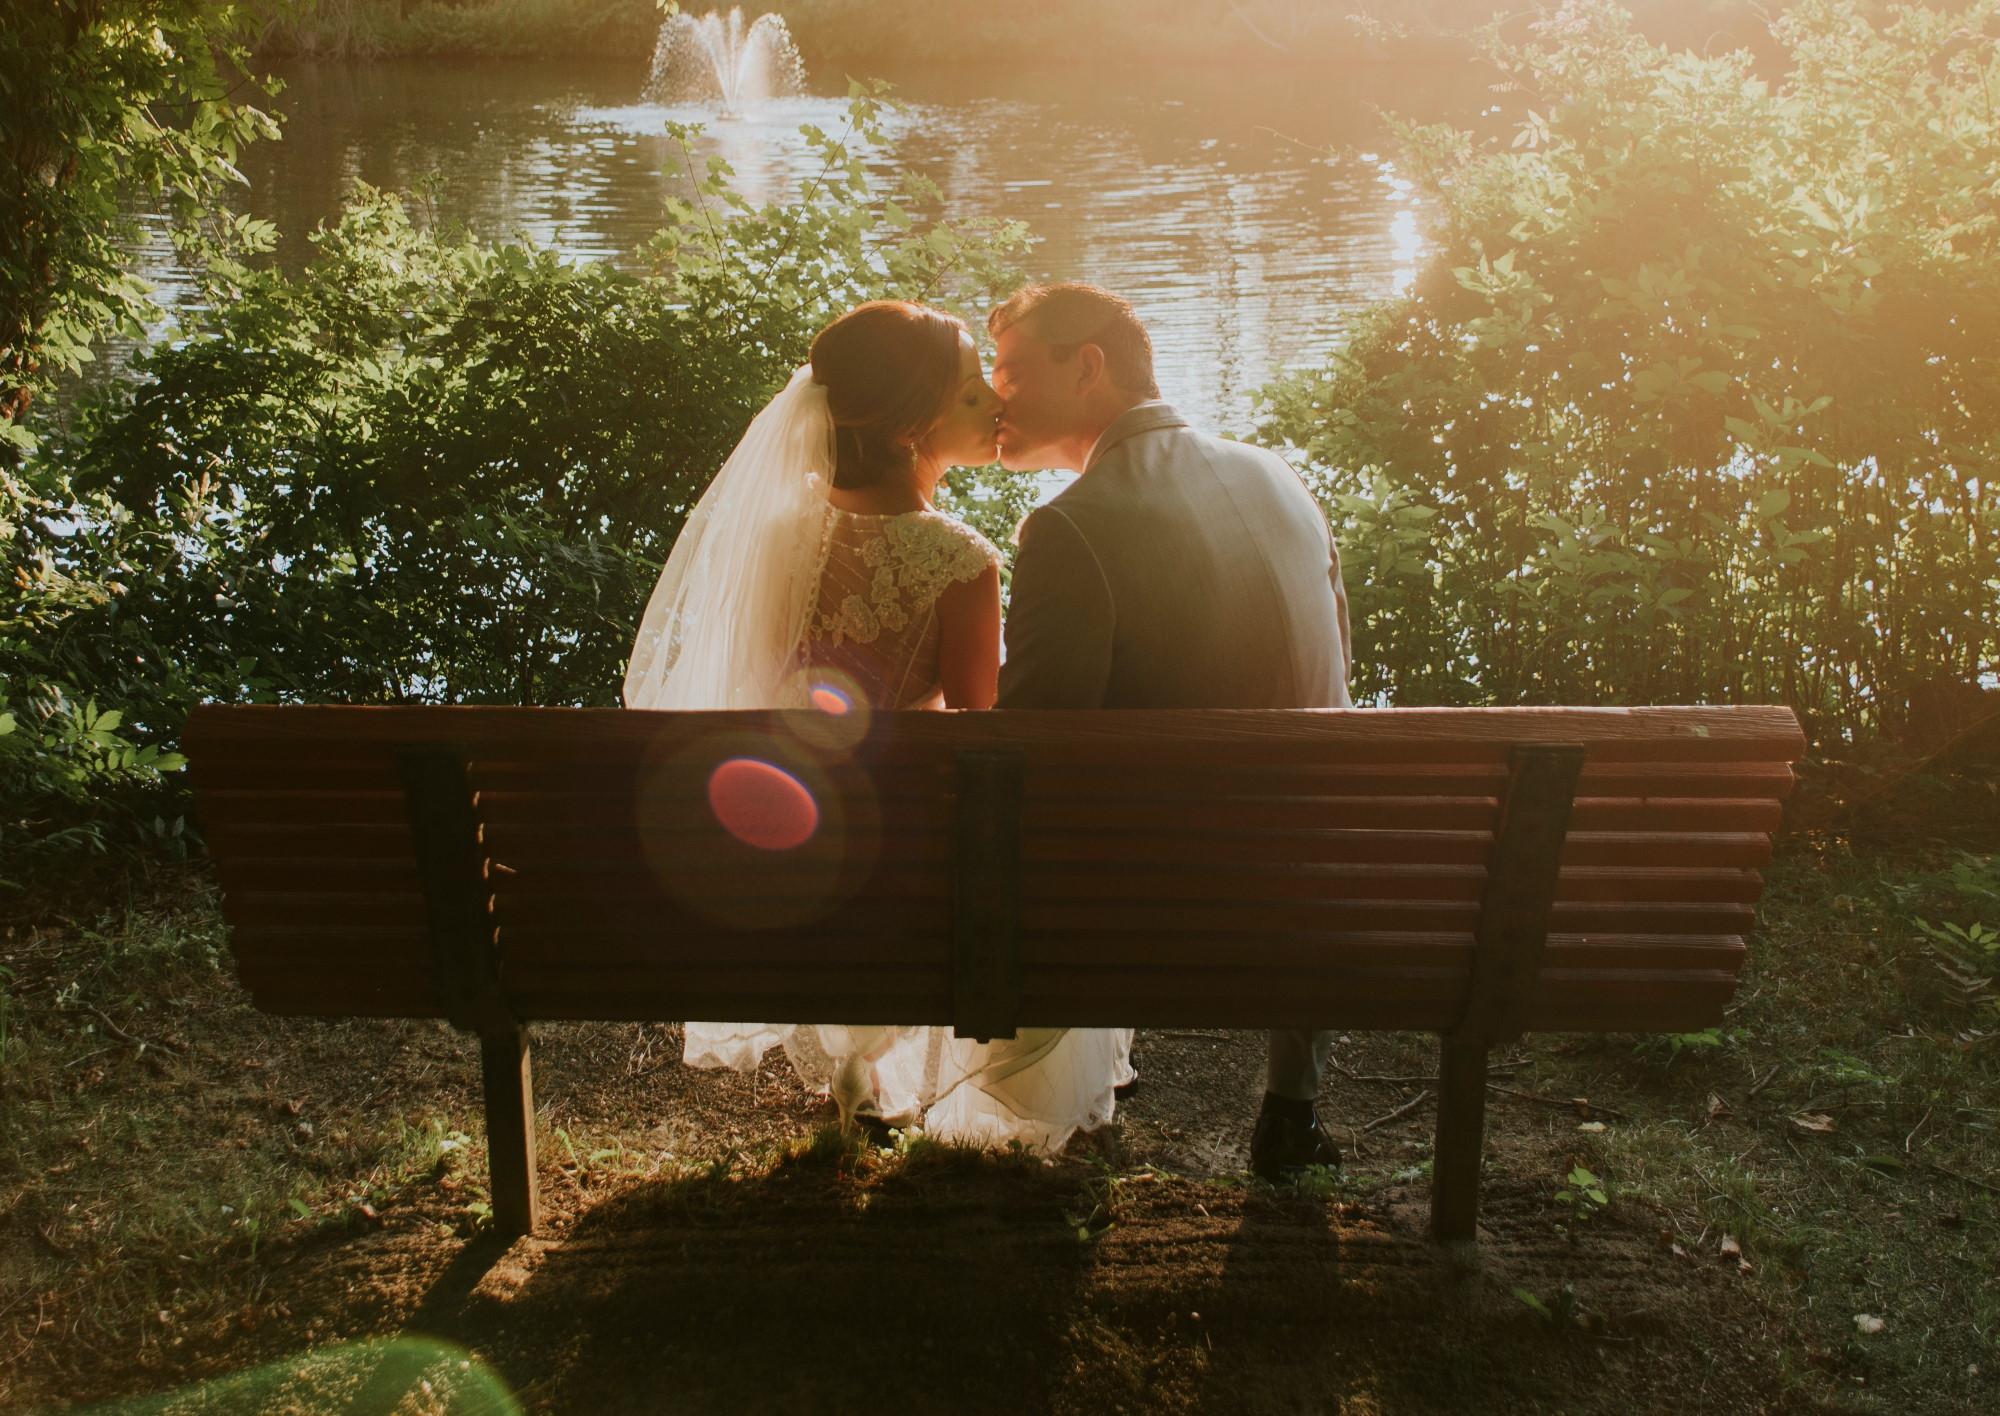 Cherish: Building a Lifelong Love